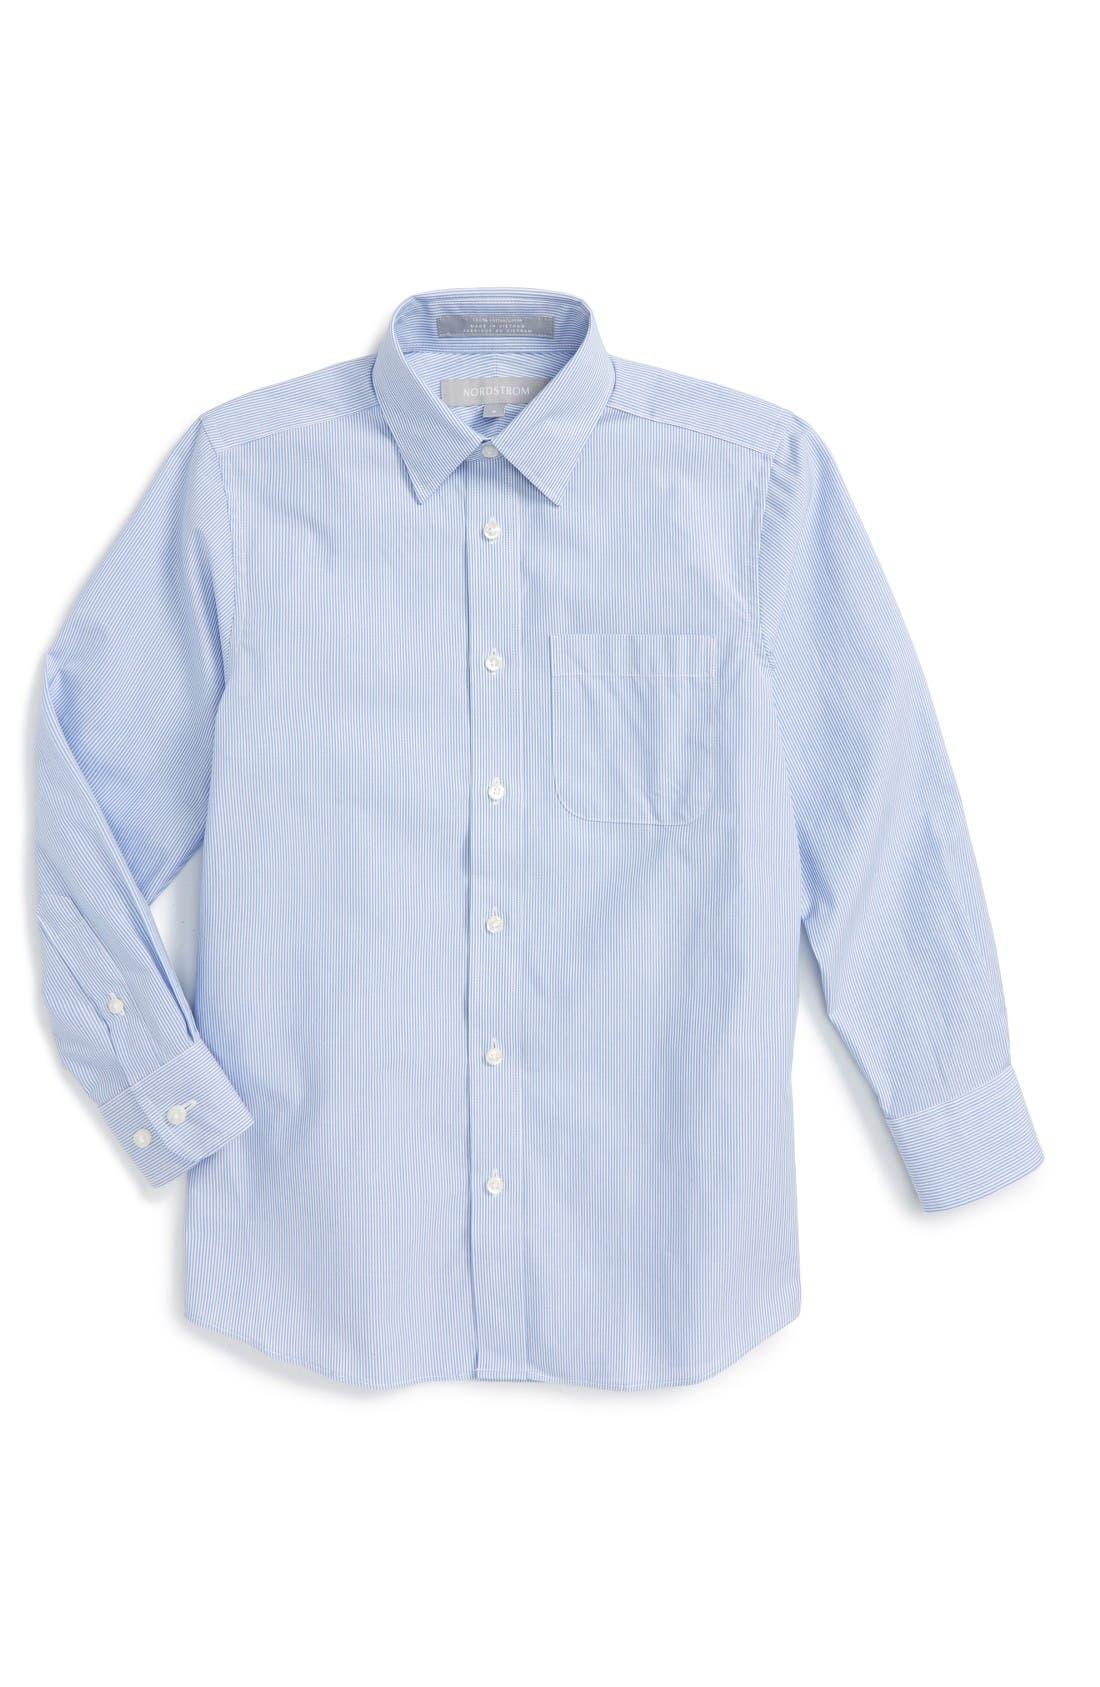 NORDSTROM Railroad Stripe Dress Shirt